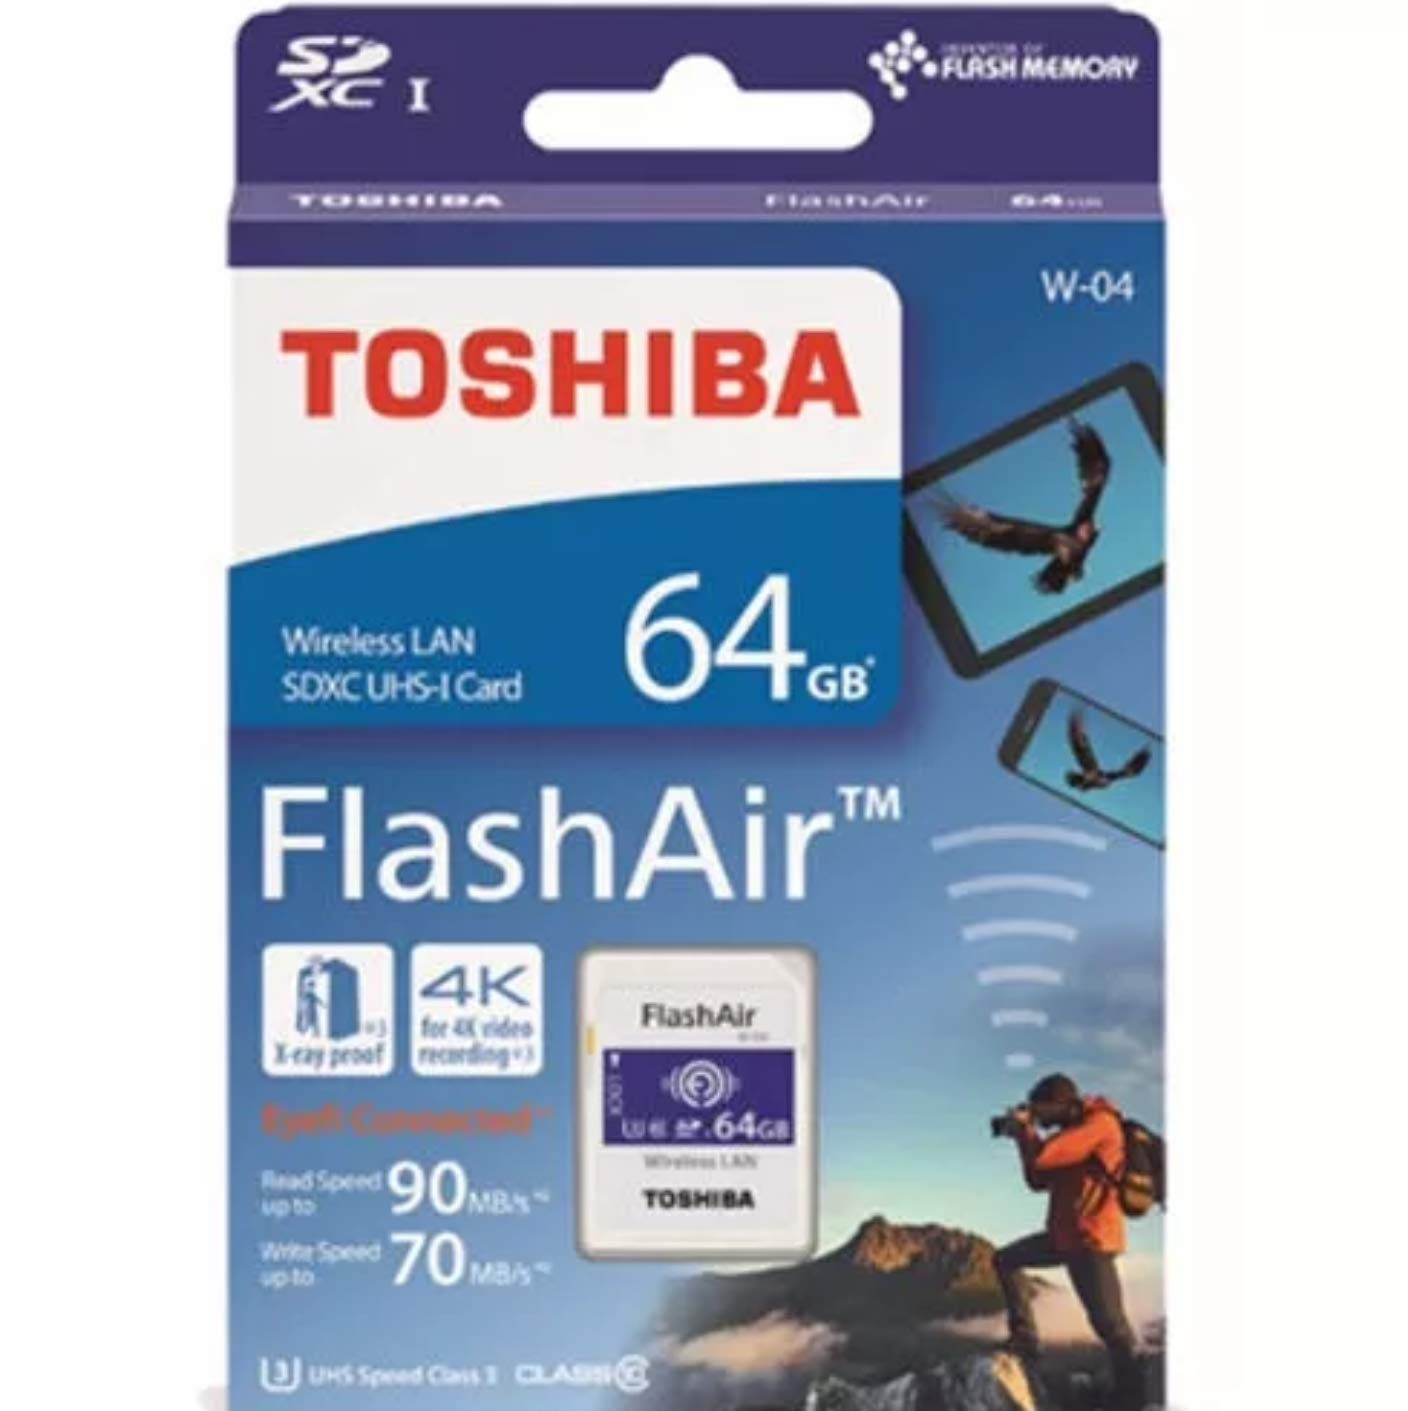 Toshiba FlashAir W 04 Class Memory